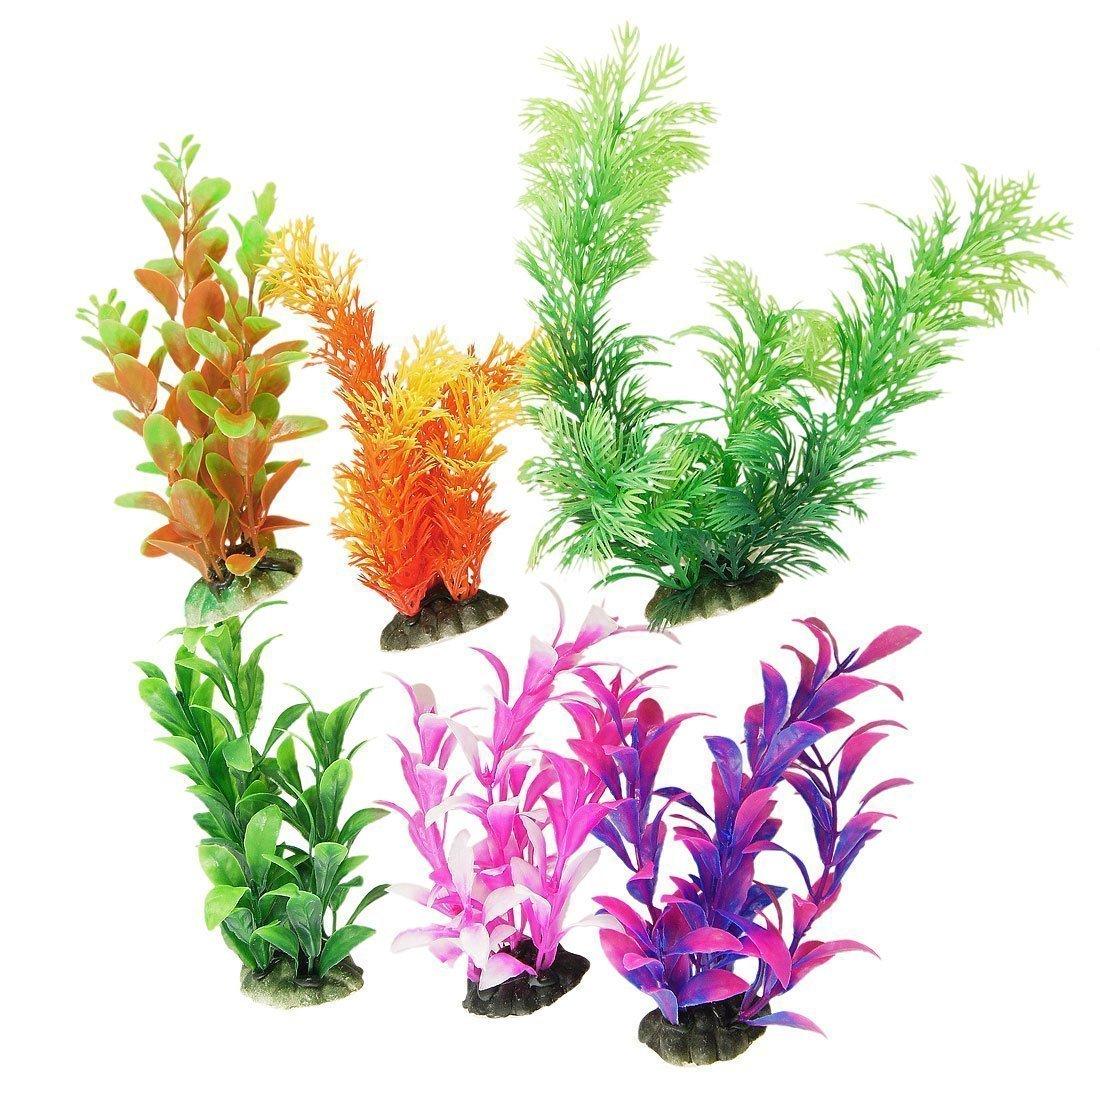 Kathy store INC 6 Pcs Assorted color Aquarium Plastic Plant Decoration Bright Multicolor Ornaments Ceramic Base